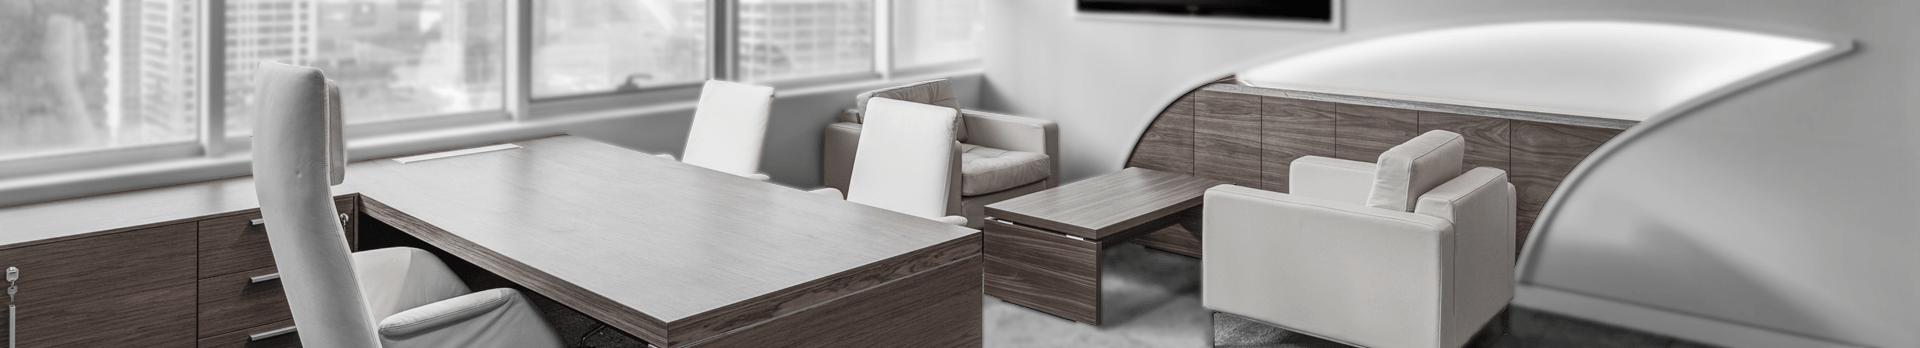 Mobiliario de Oficina | Muebles, Sillas, Mesas | Mobelfy ®